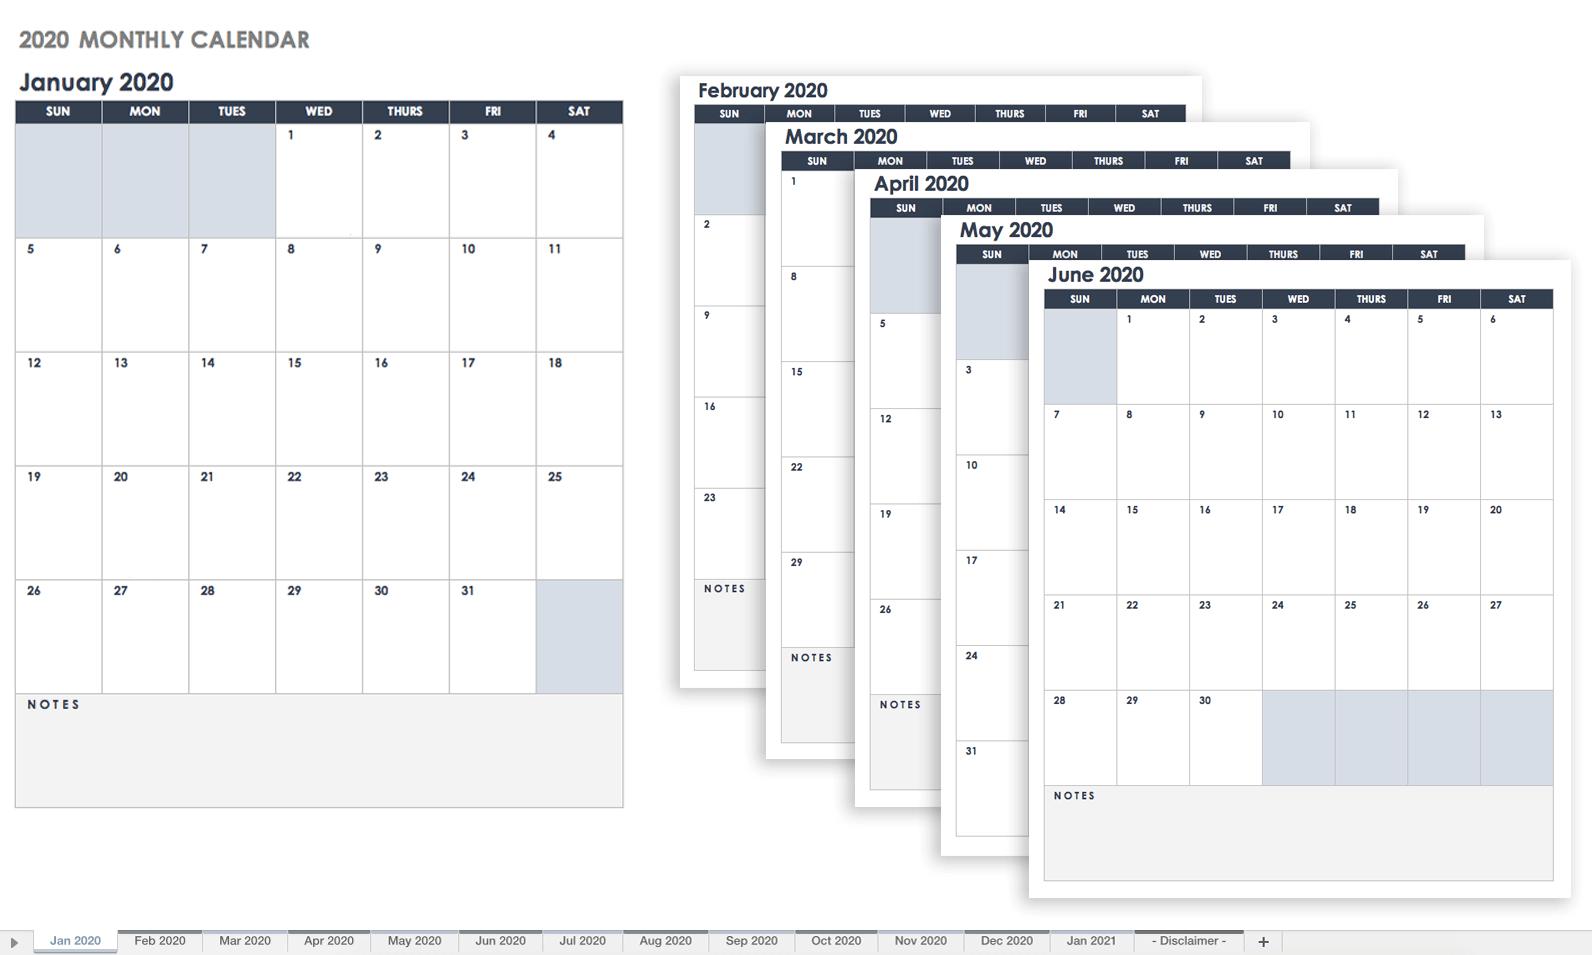 Free Google Calendar Templates | Smartsheet pertaining to 2020 Calander To Write On